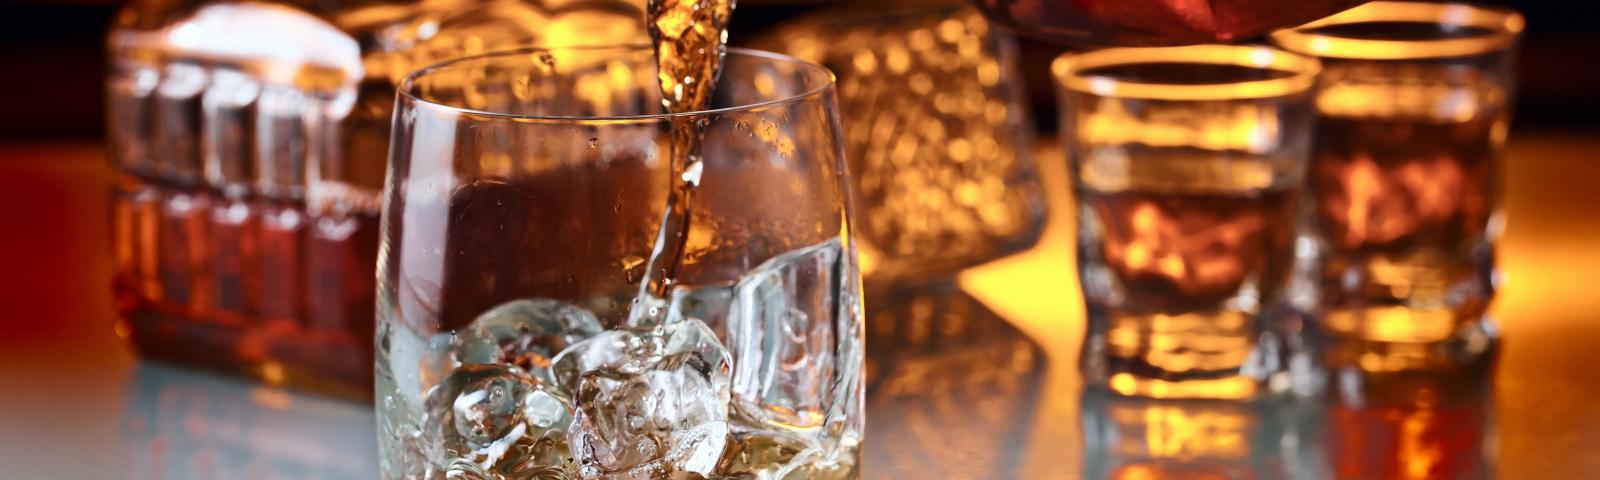 стакани для виски фото